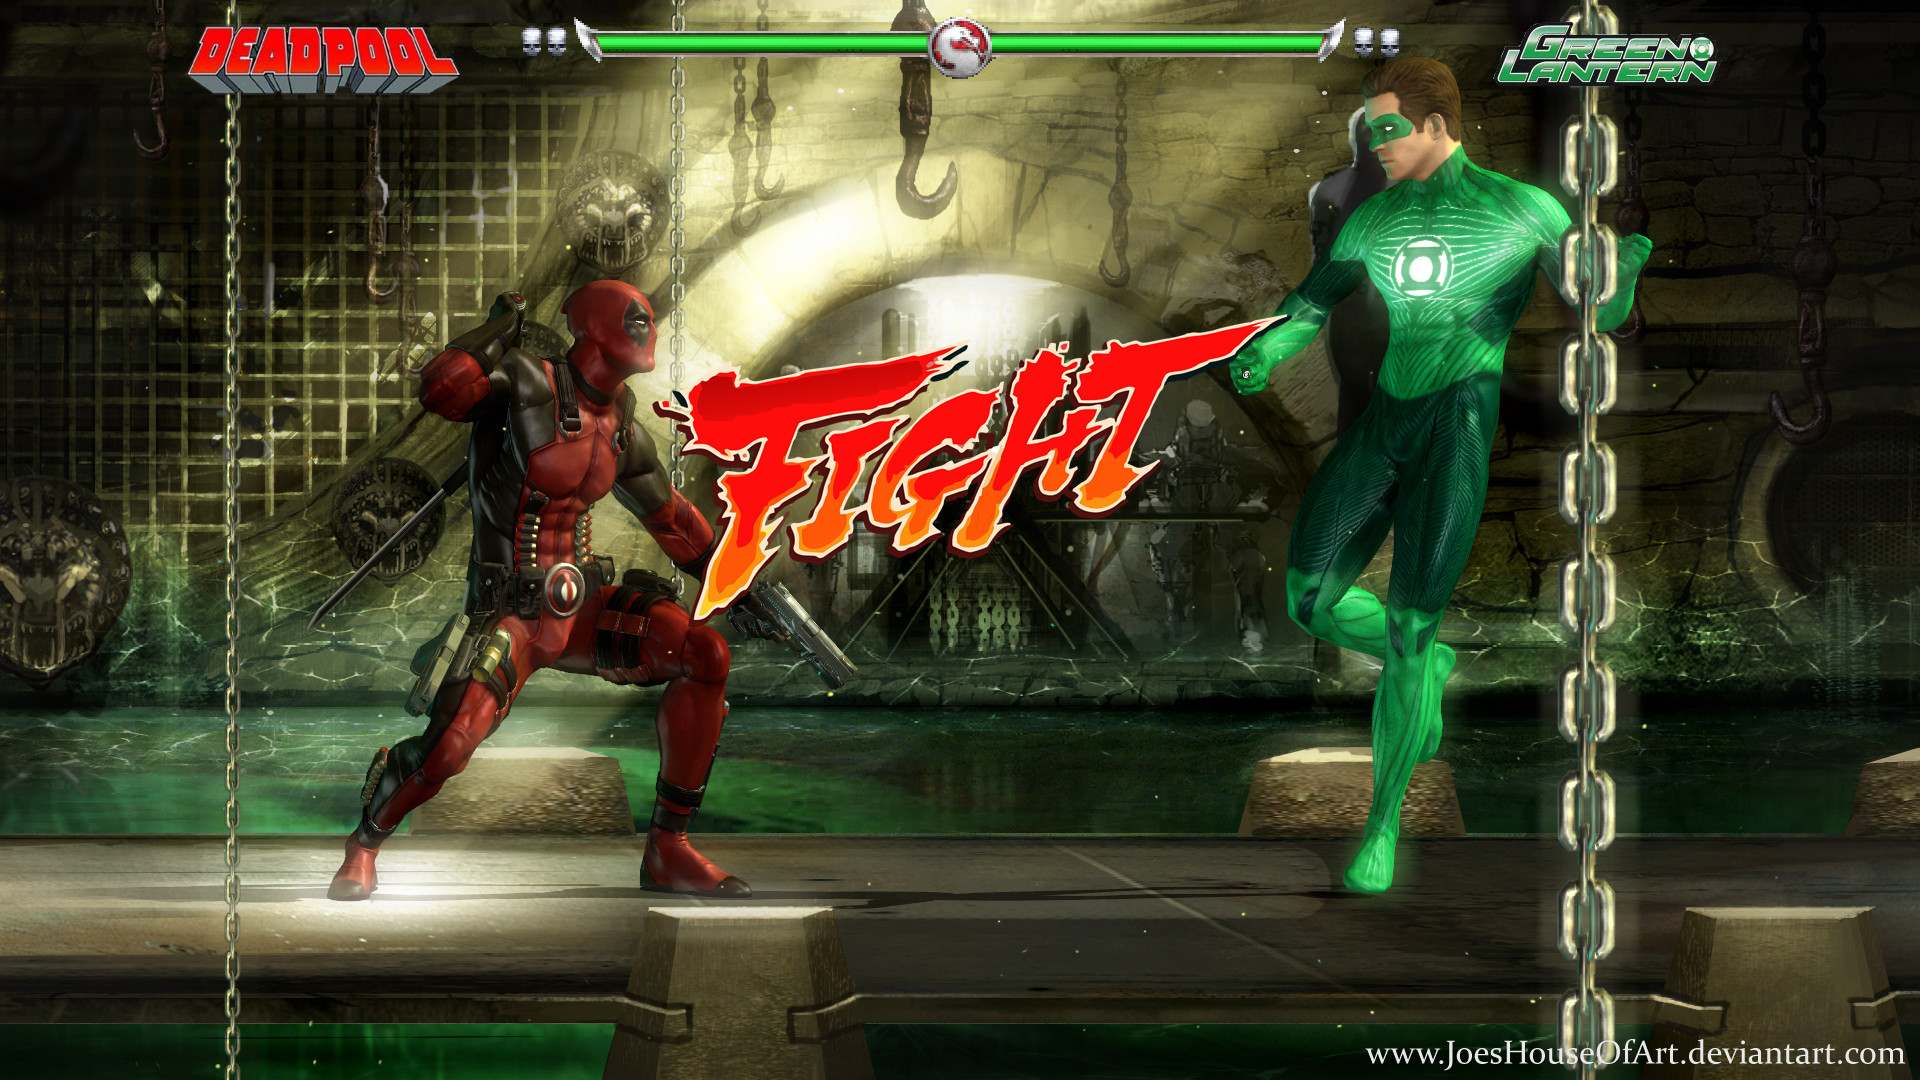 Super Heros Miniature Game Krossover_kombat___deadpool_v_green_lantern_by_joeshouseofart-d9ovbbu